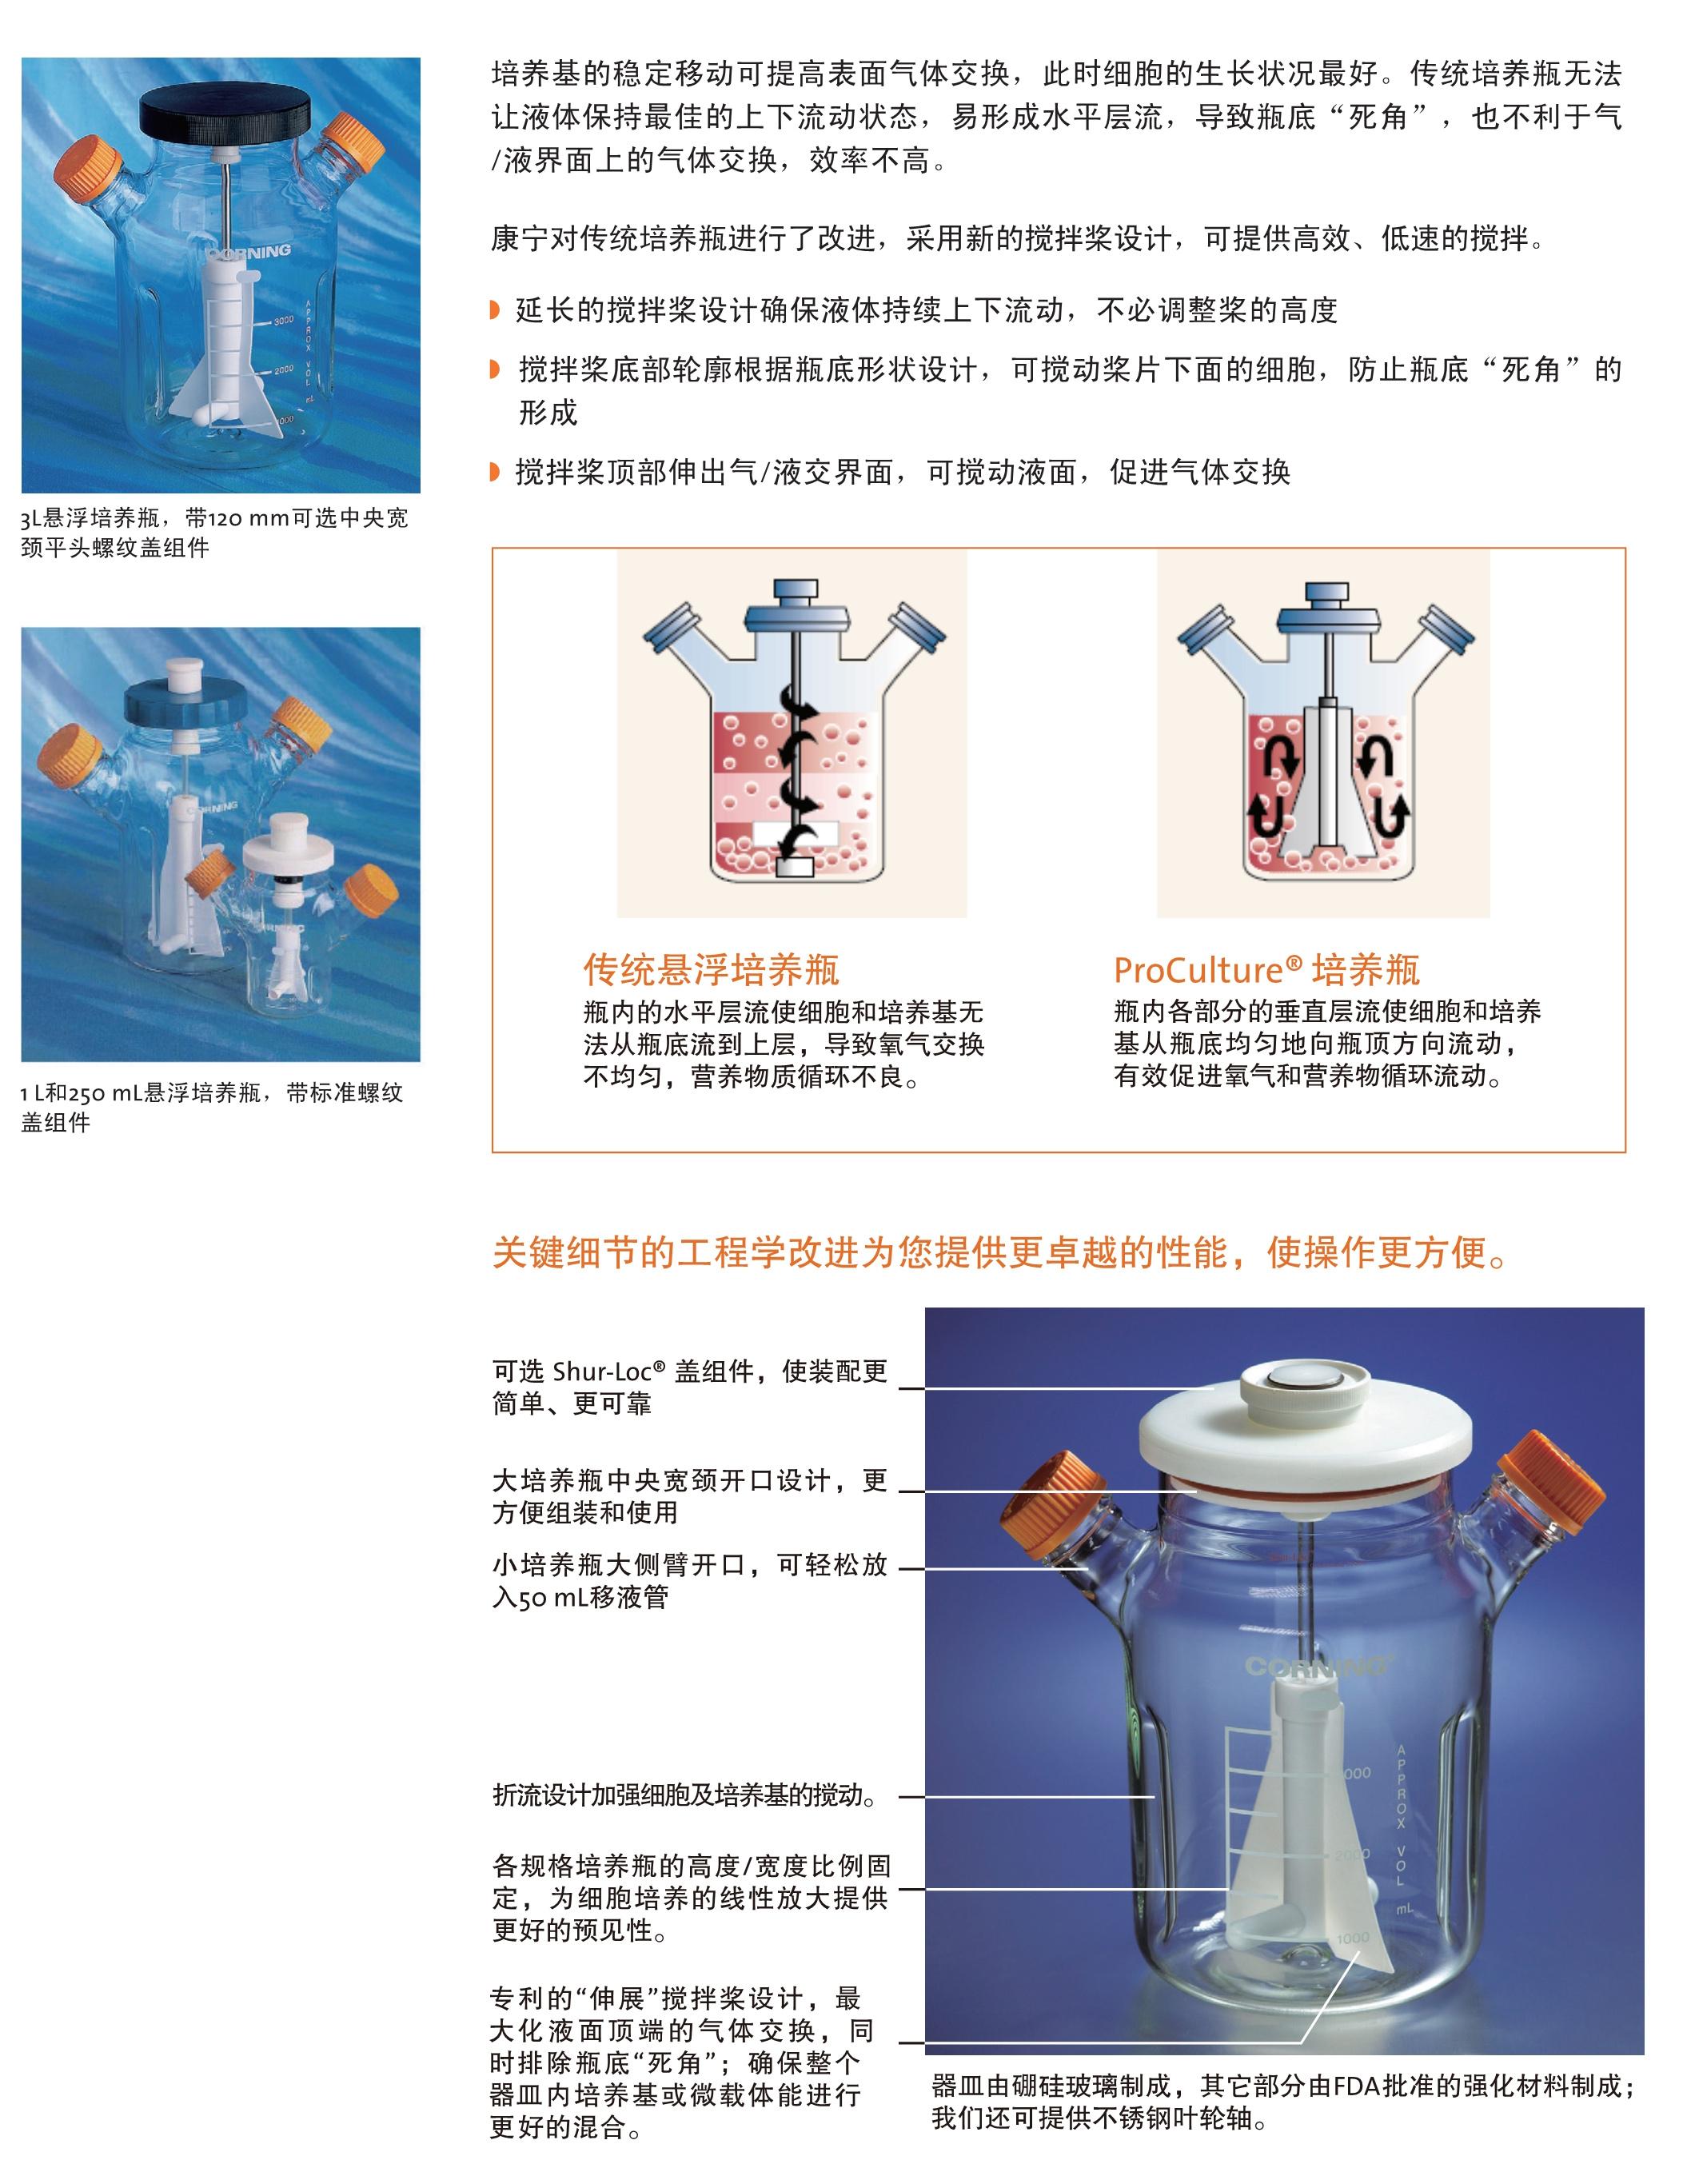 ProCulture® Spinner Flask 悬浮细胞培养瓶